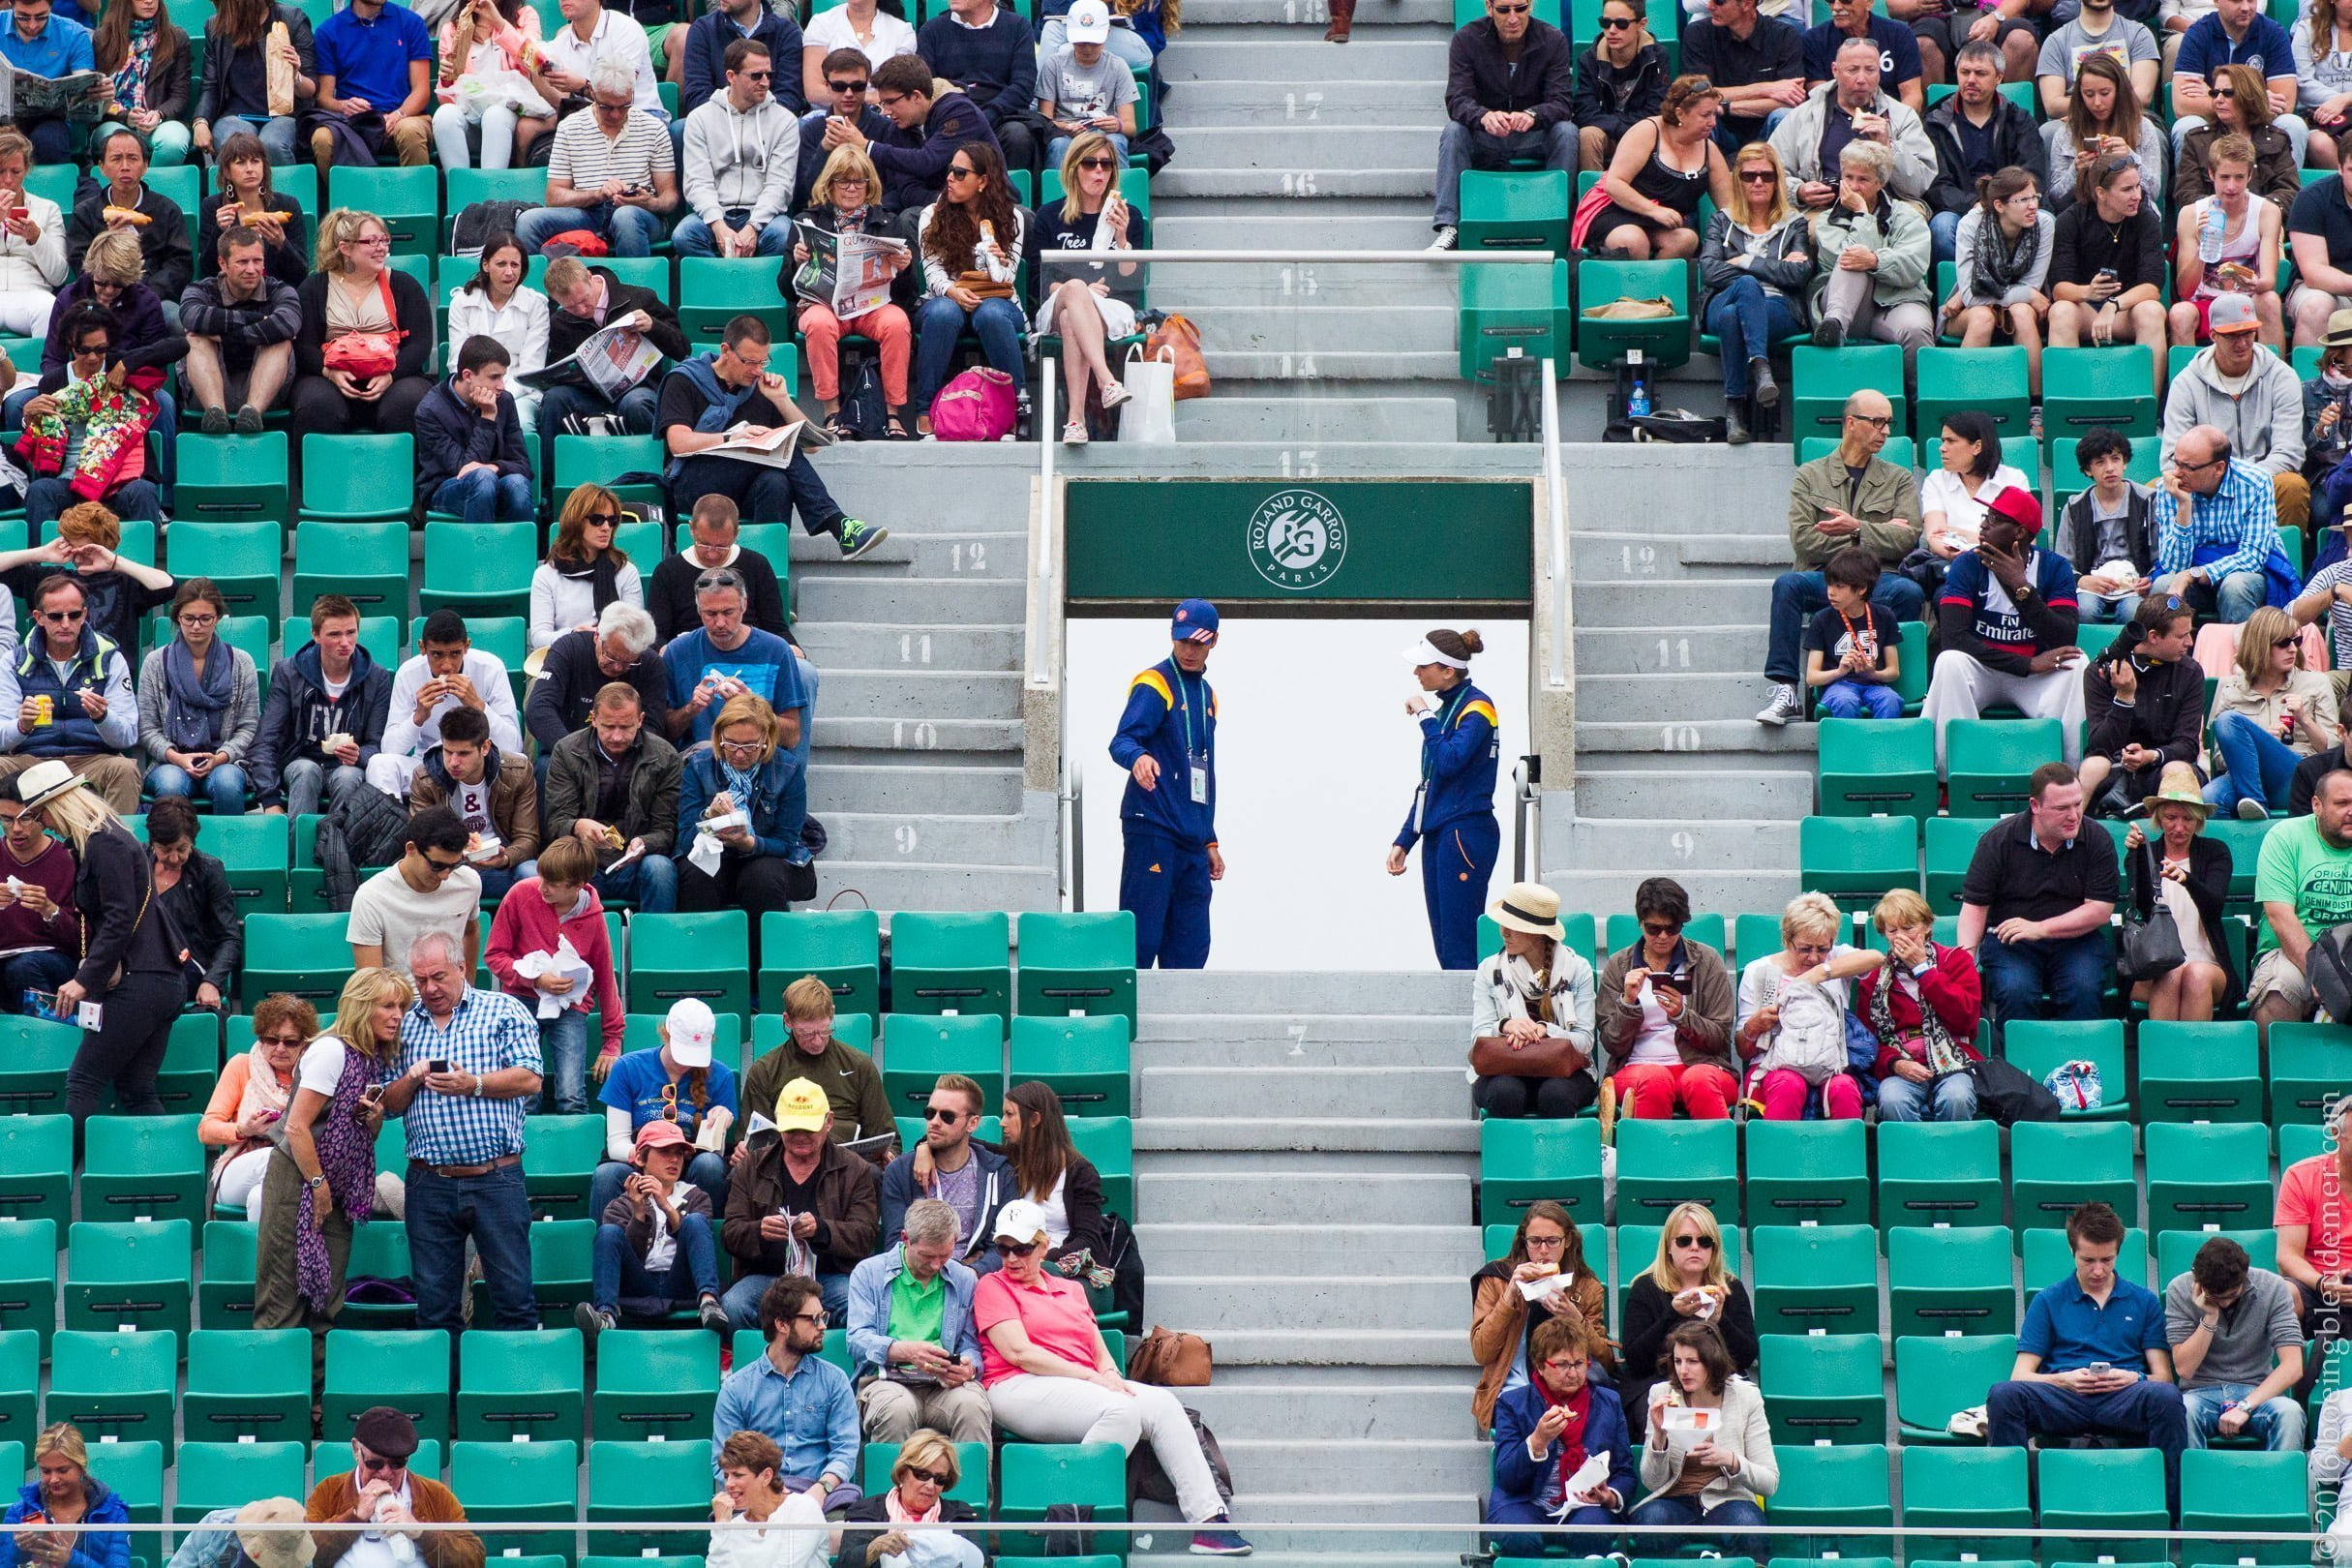 Roland Garros: placiers et gradins